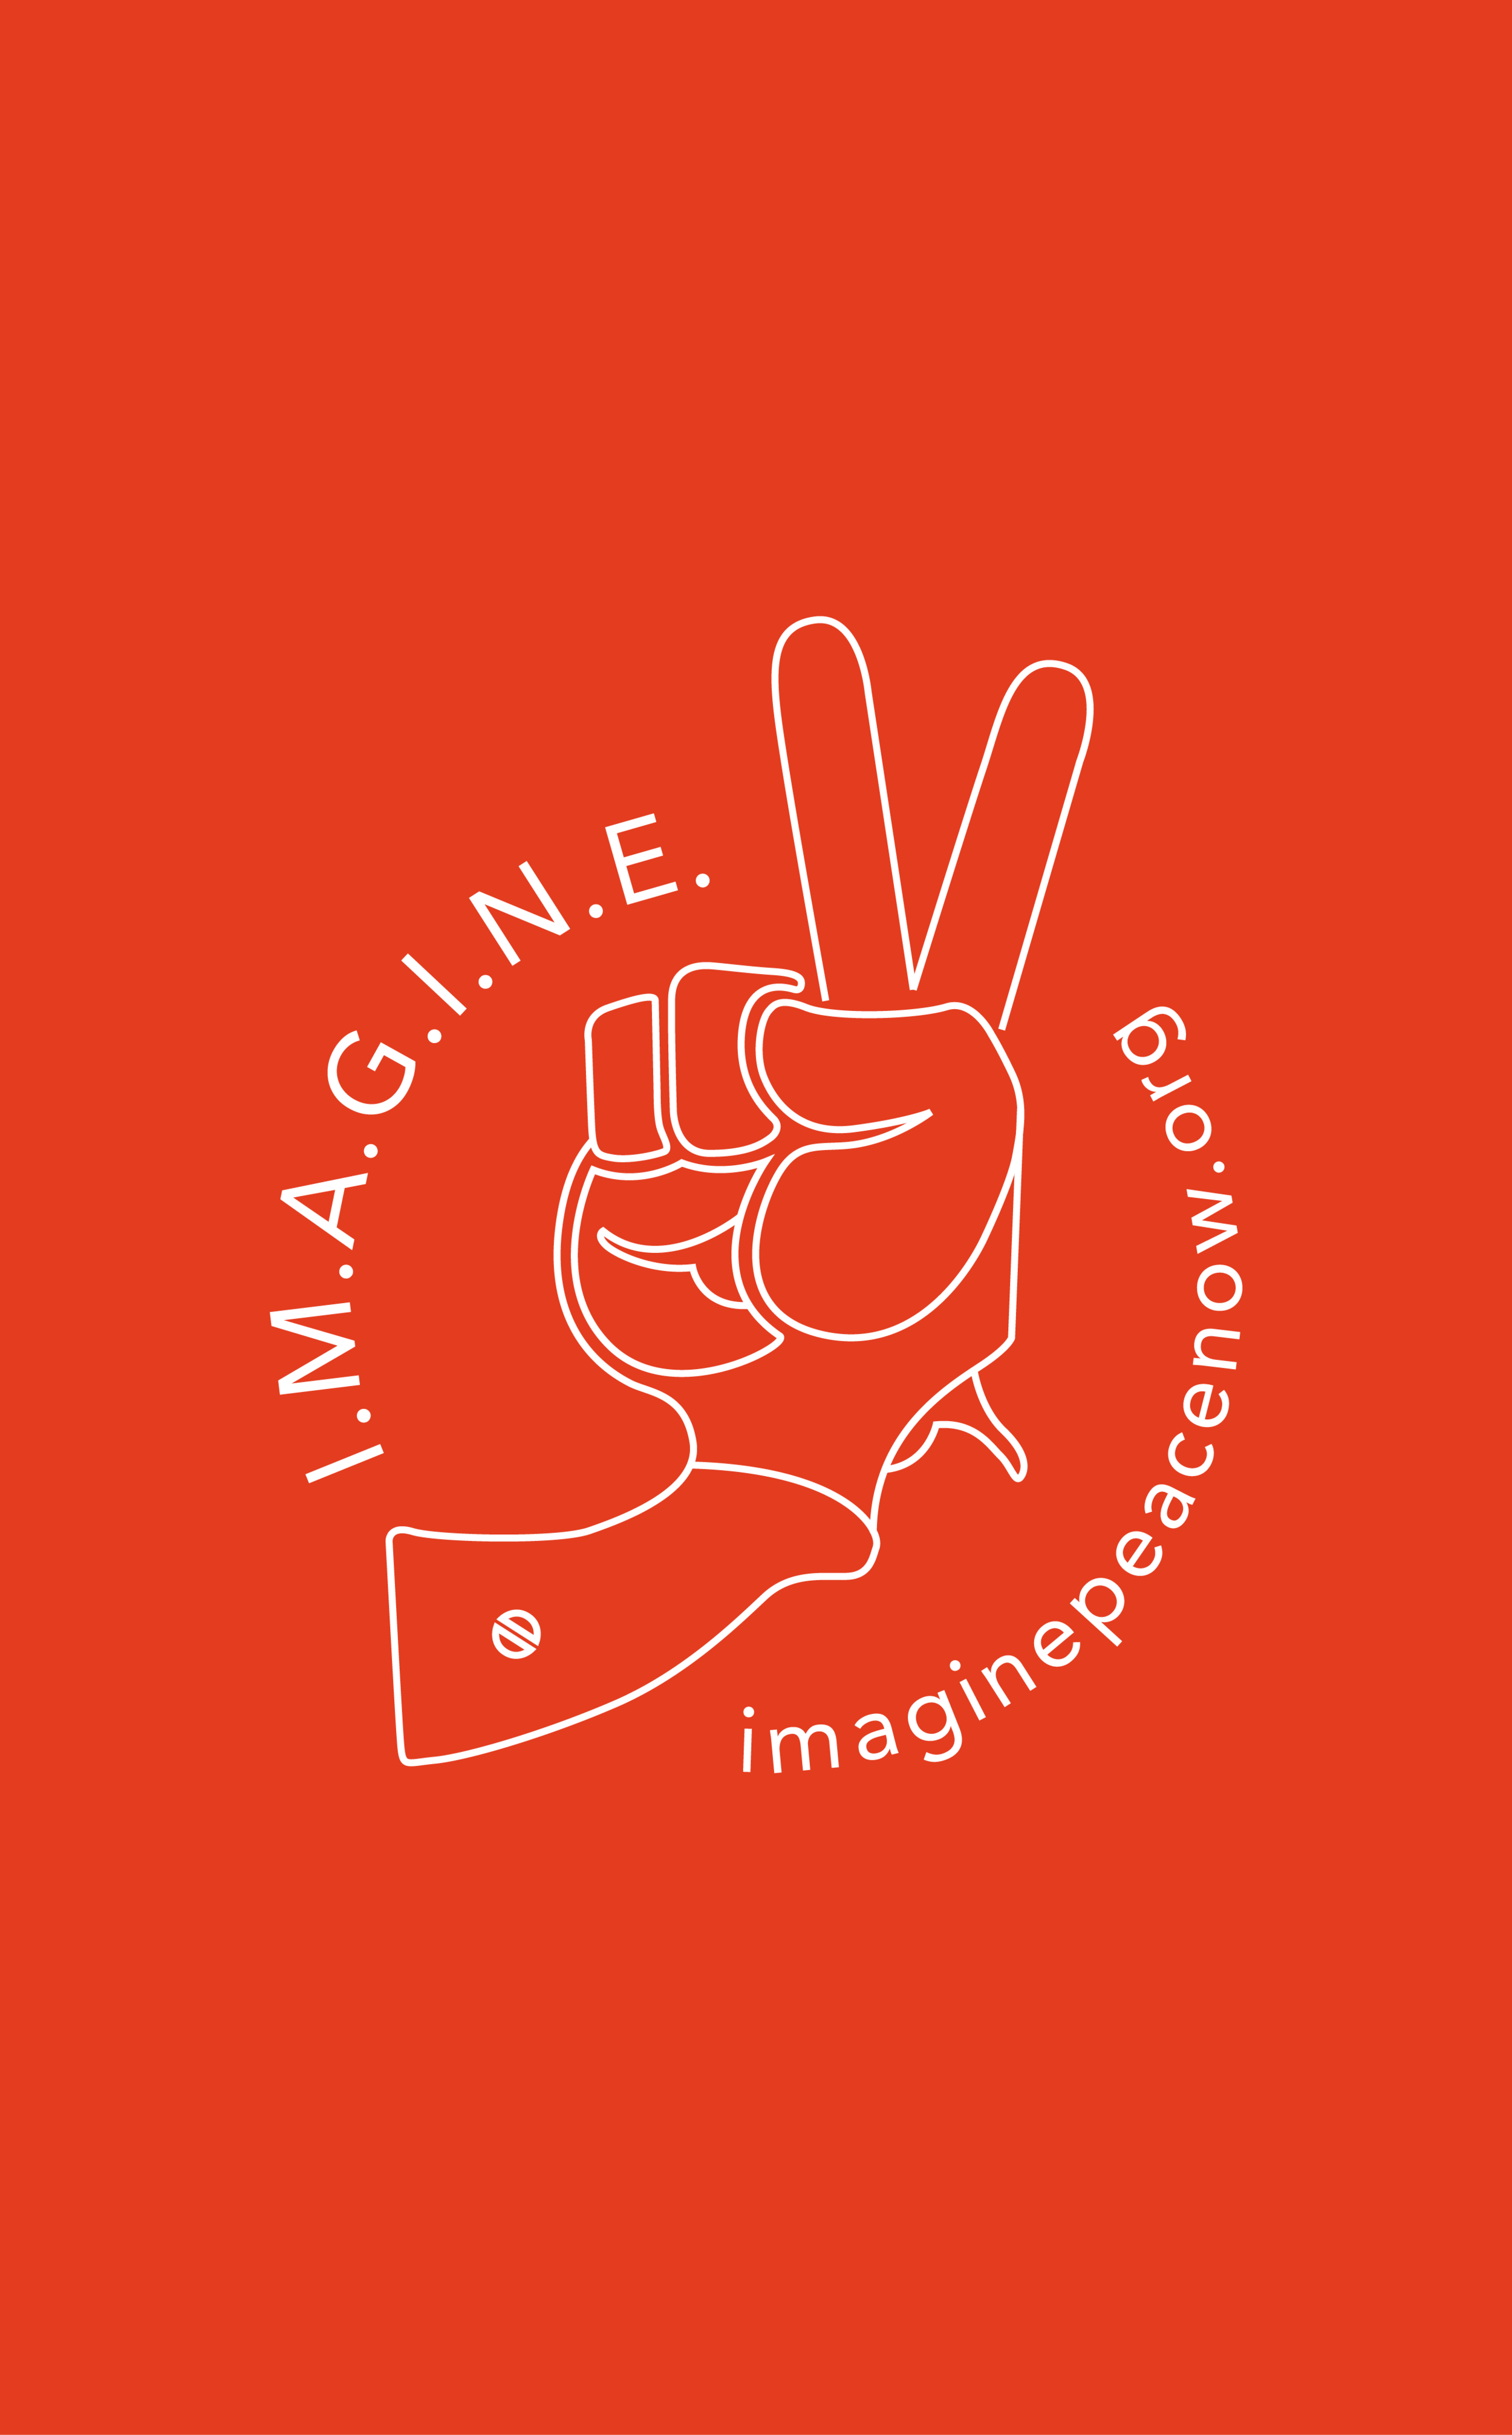 Imagine Peace Now Book, logo, logo design, graphic design, graphic designer, Rhode Island based graphic designer